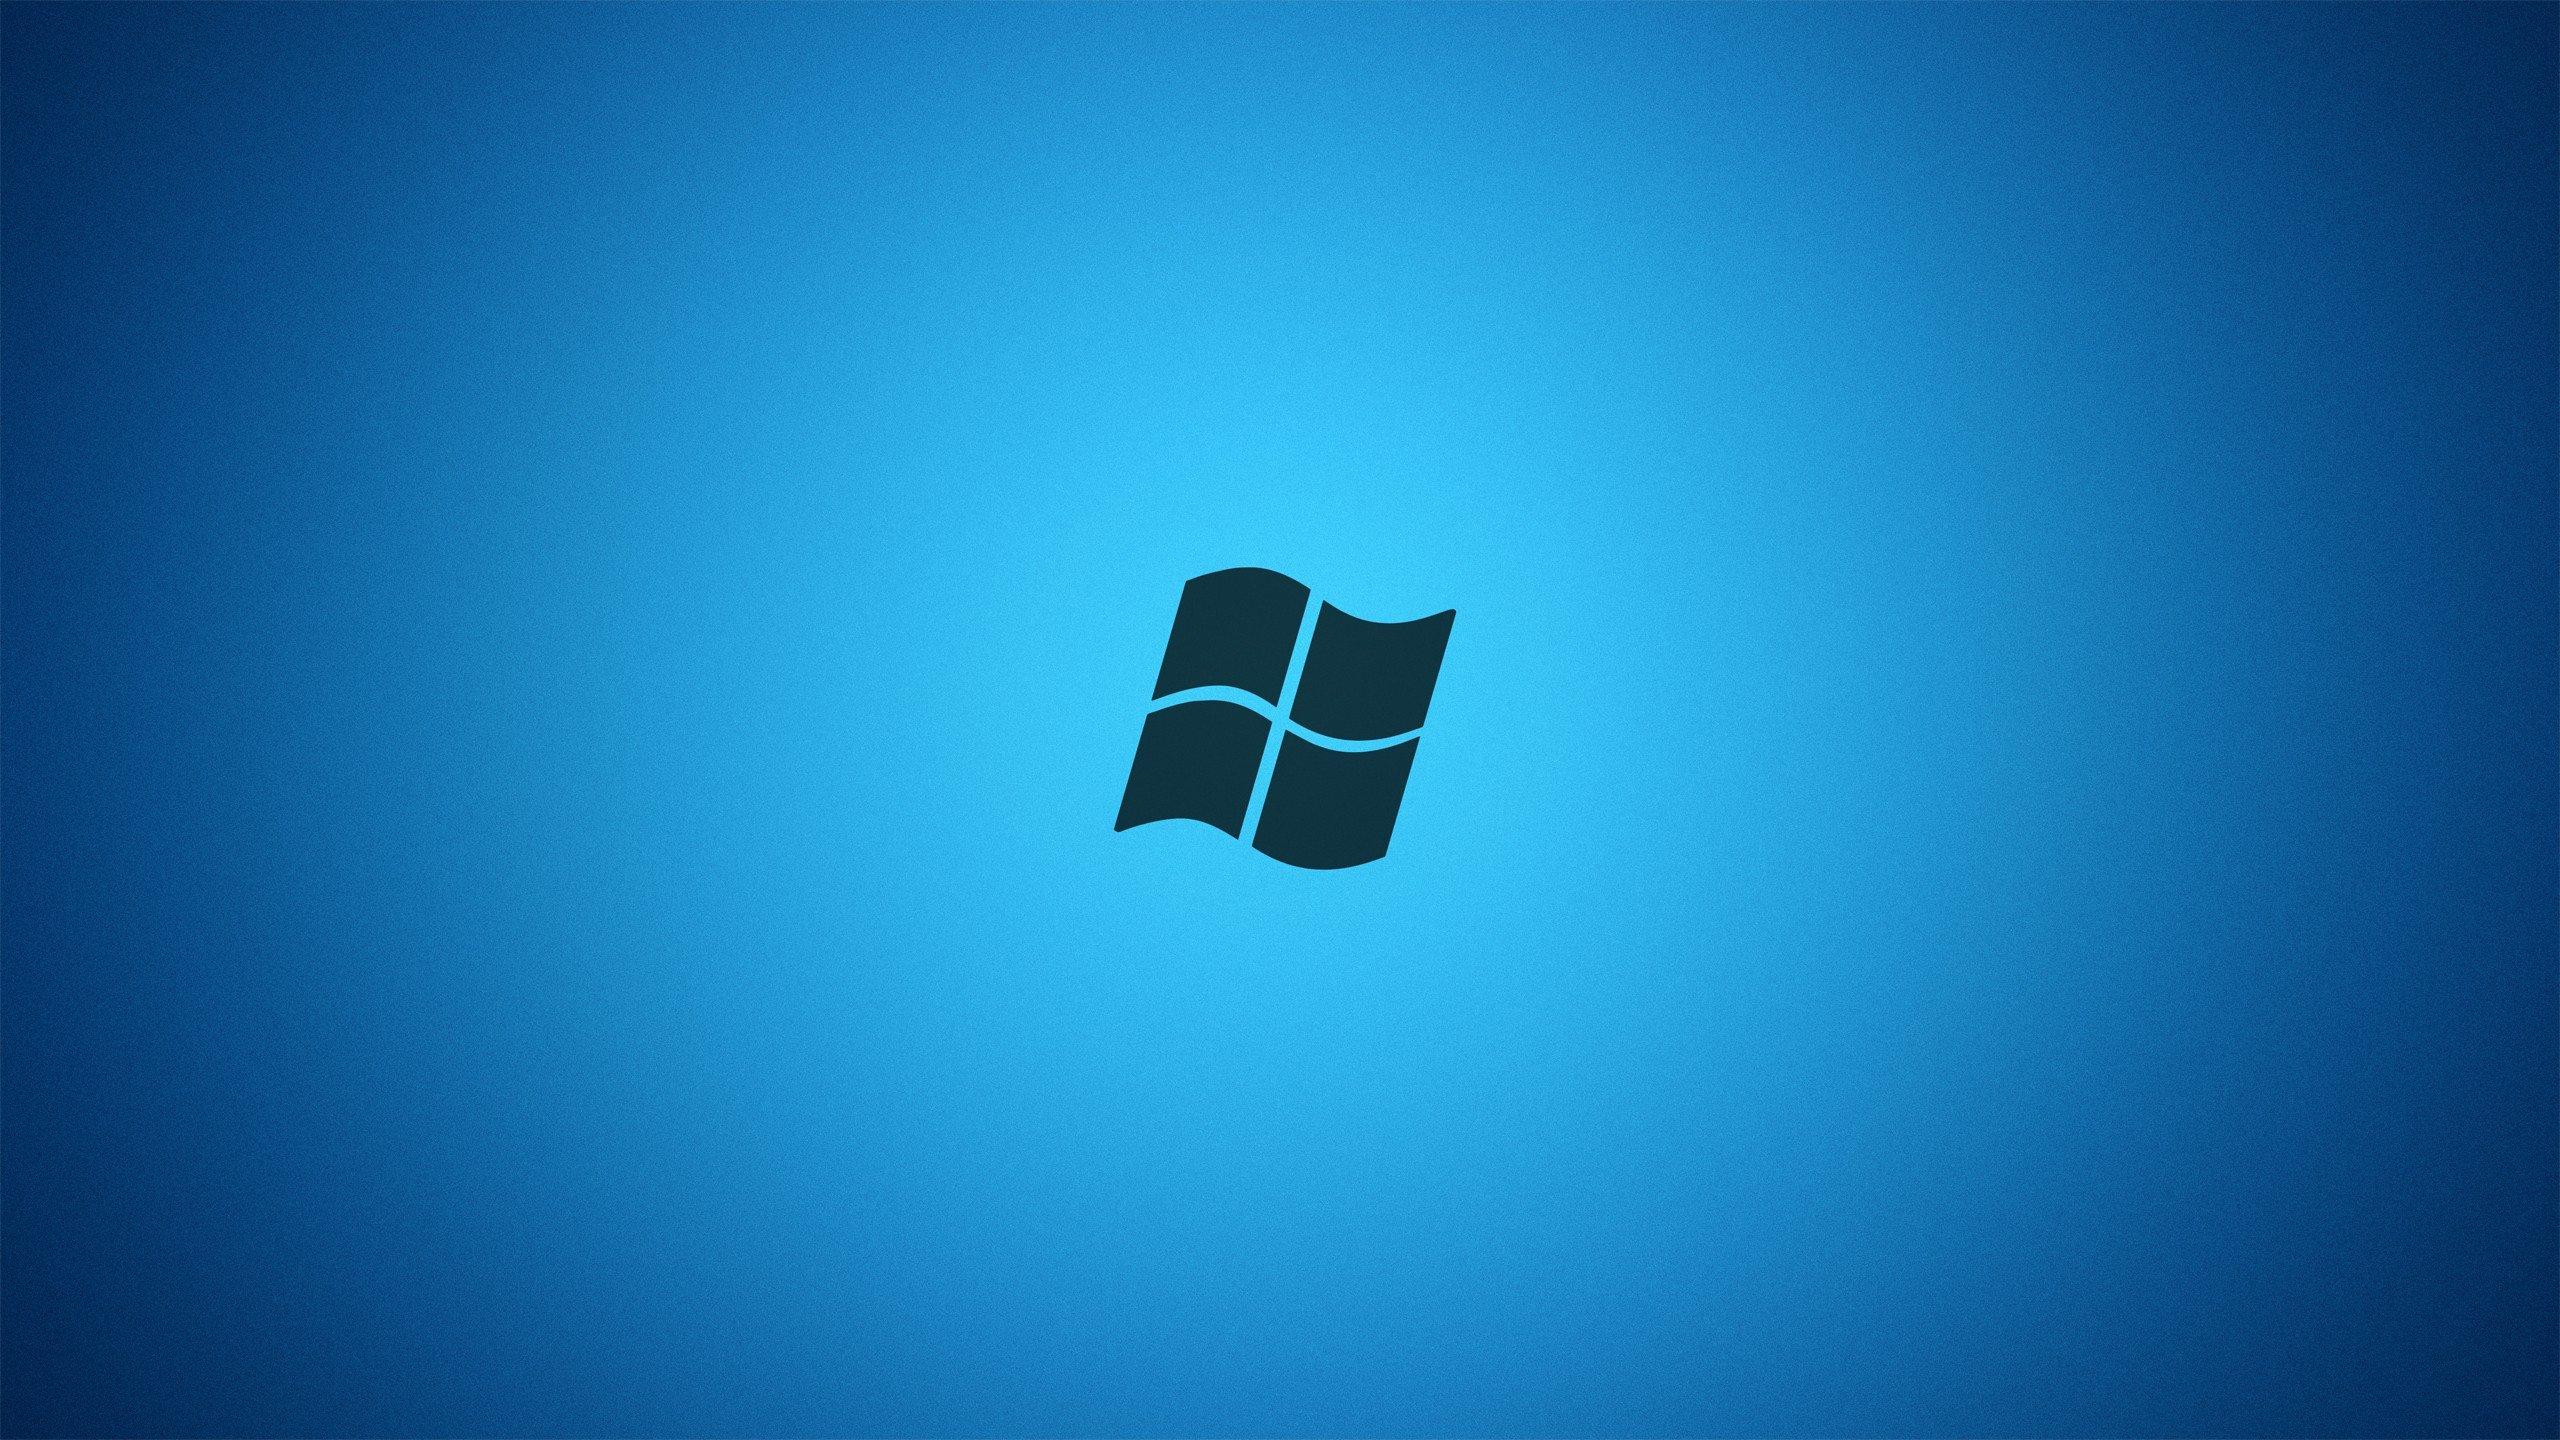 Masaüstü 2560x1440 Piksel Windows 10 2560x1440 Wallpaperup